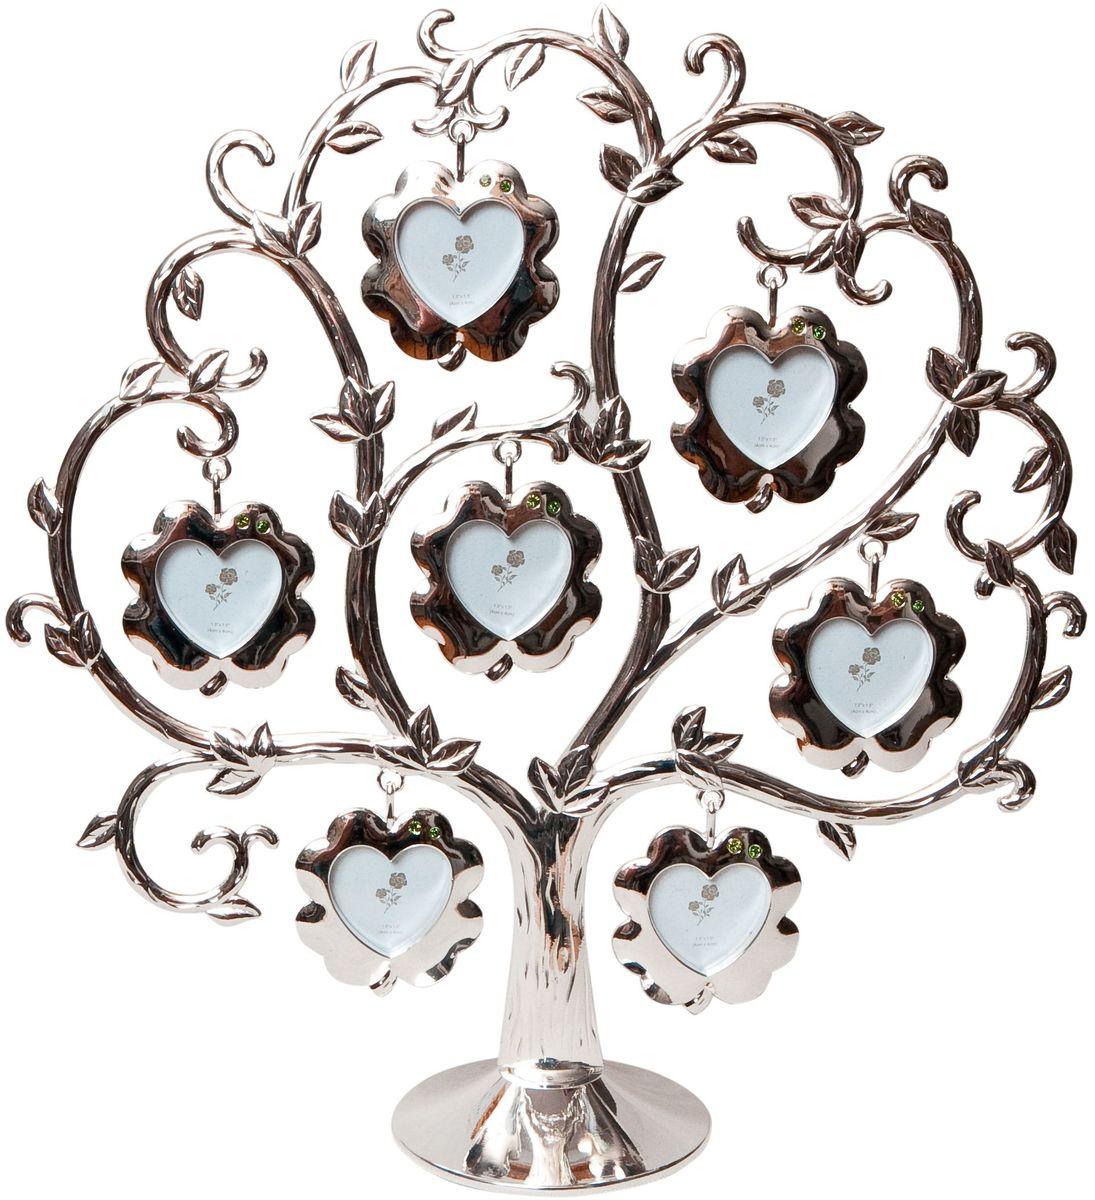 Фоторамка декоративная Platinum Дерево, на 7 фото, высота 25 см. PF9460BS7 фоторамок на дереве PF9460BSРодословное дерево с фото 4x4 см.